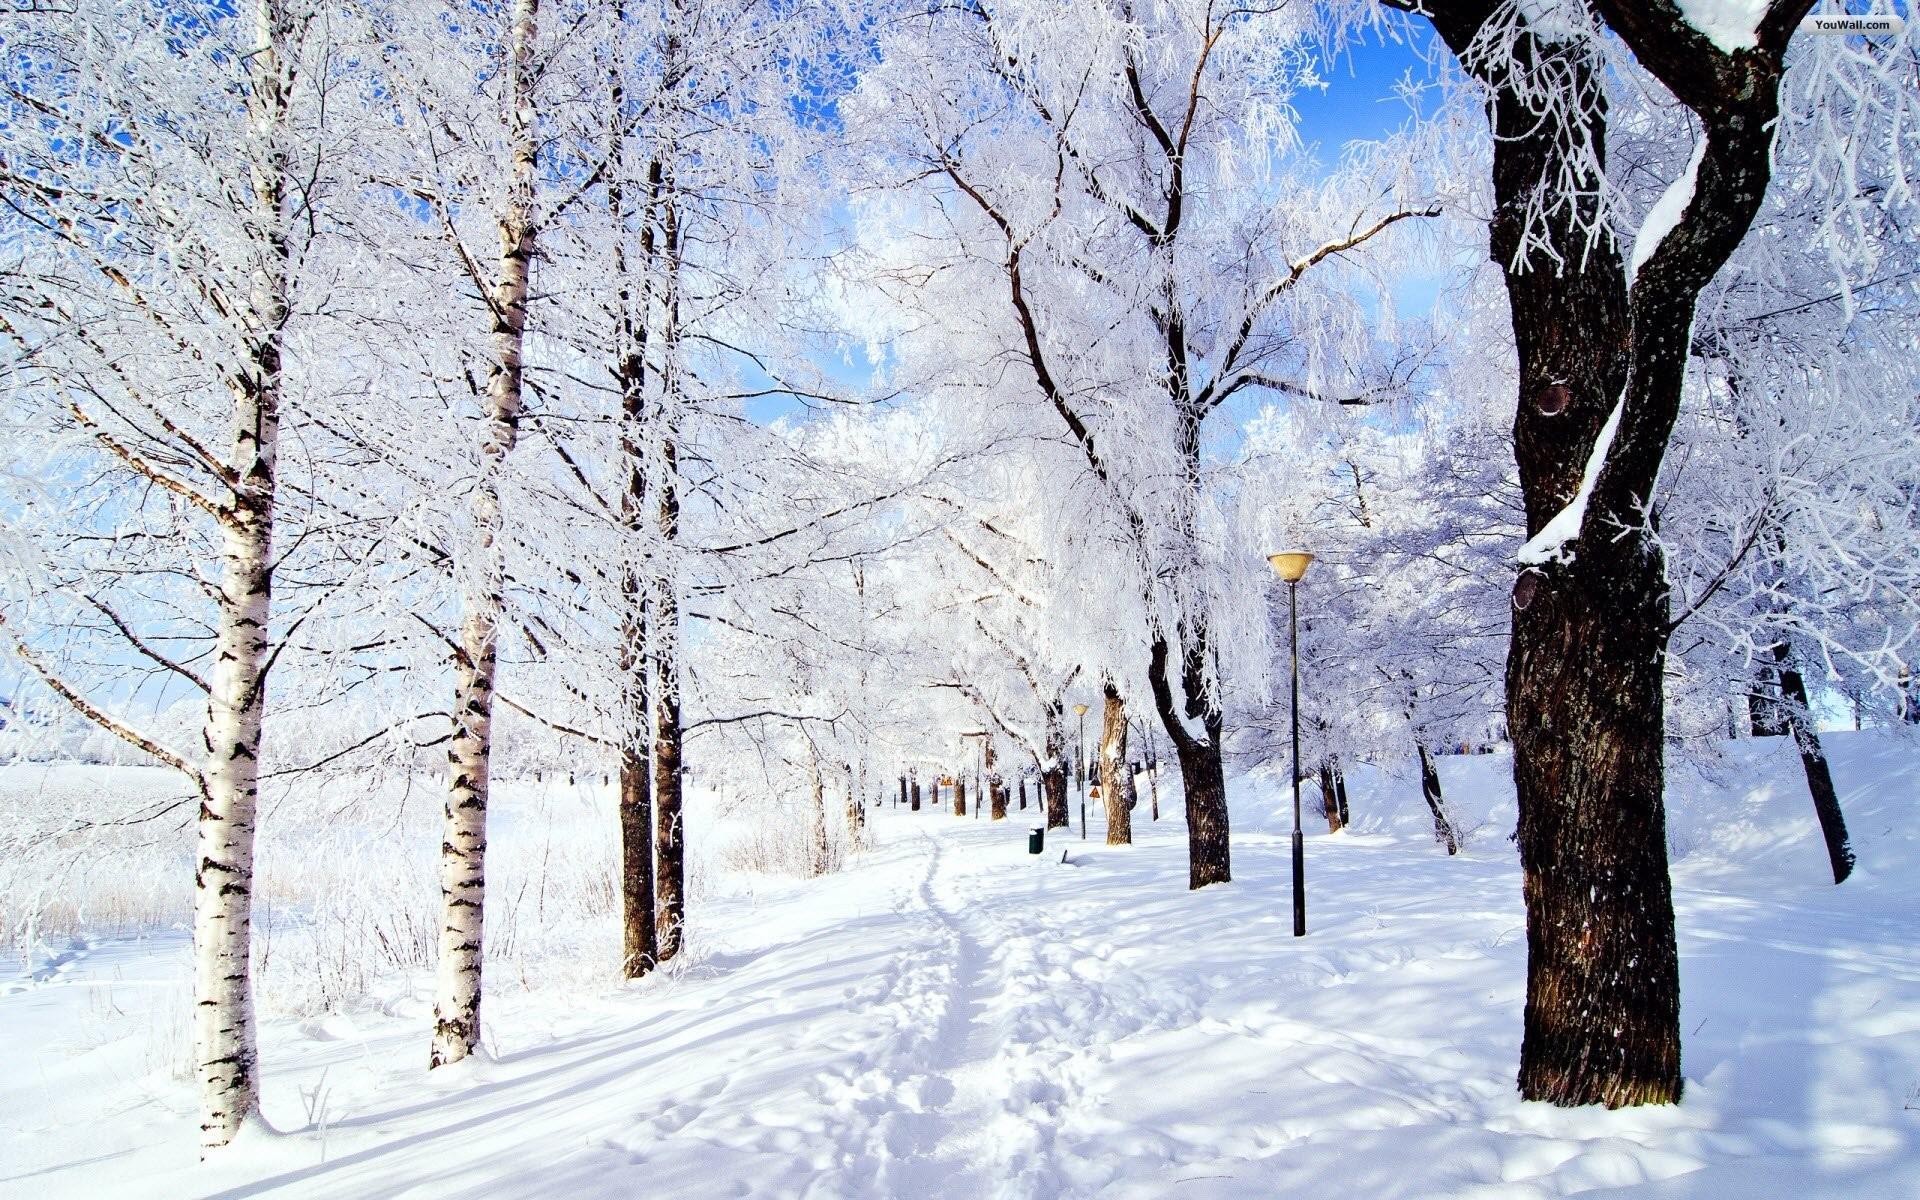 Snowy Park Wallpaper